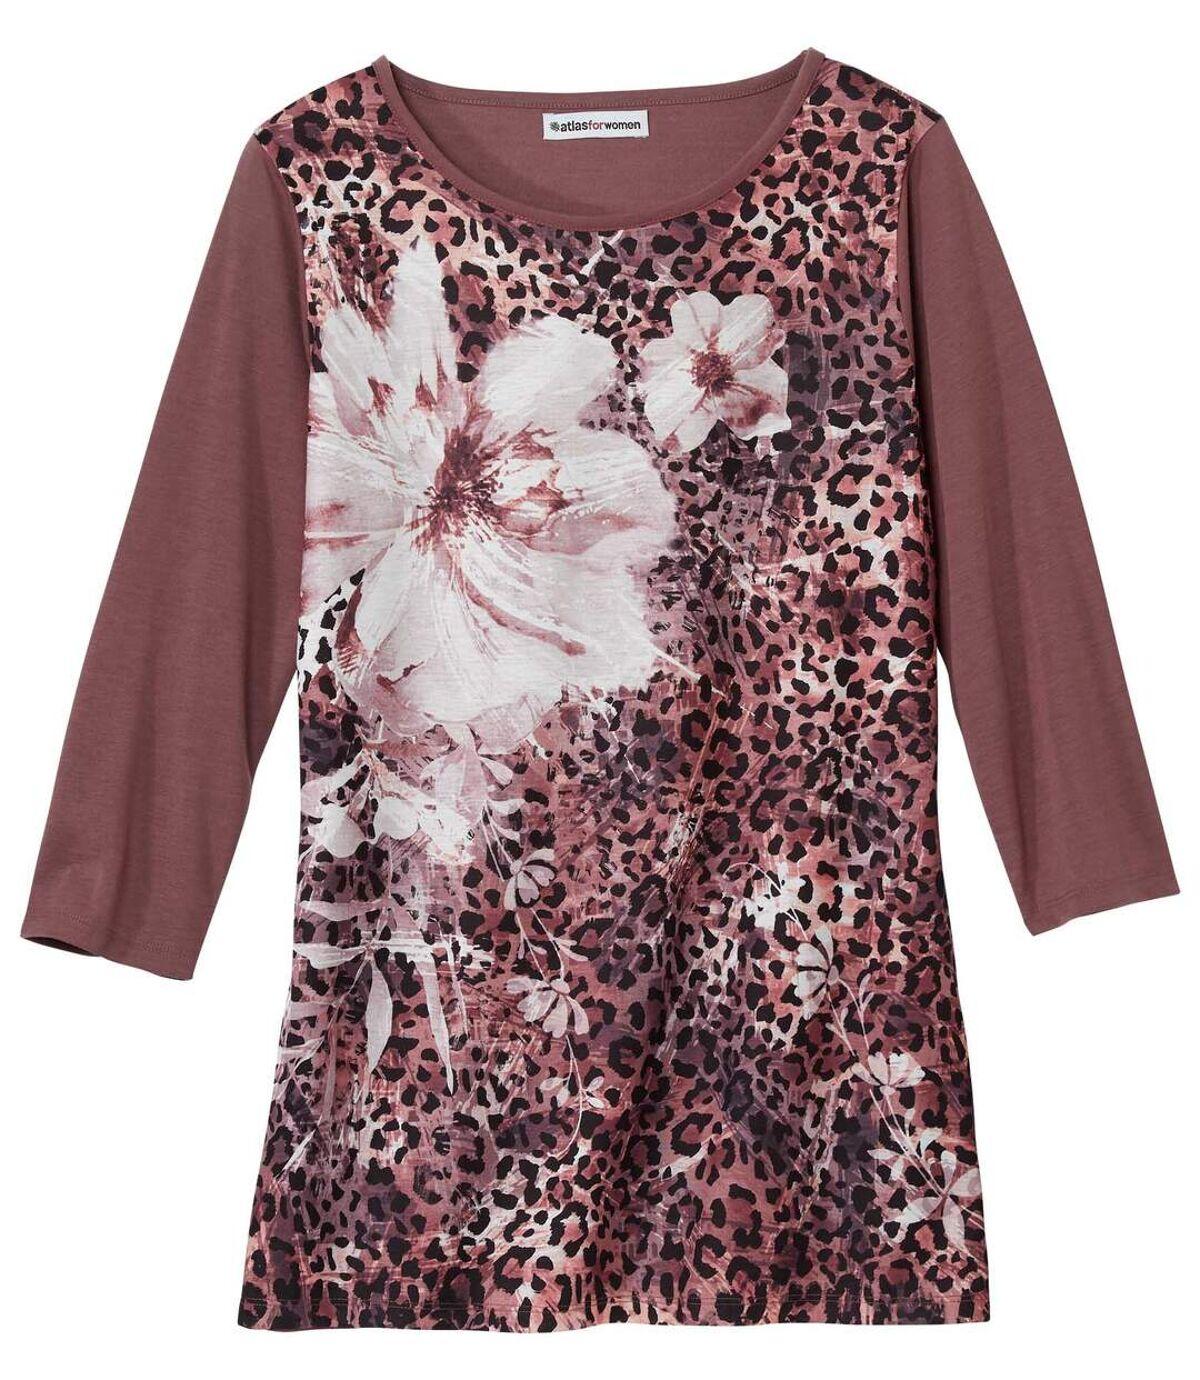 Women's Floral Leopard Print Top - Pink Atlas For Men